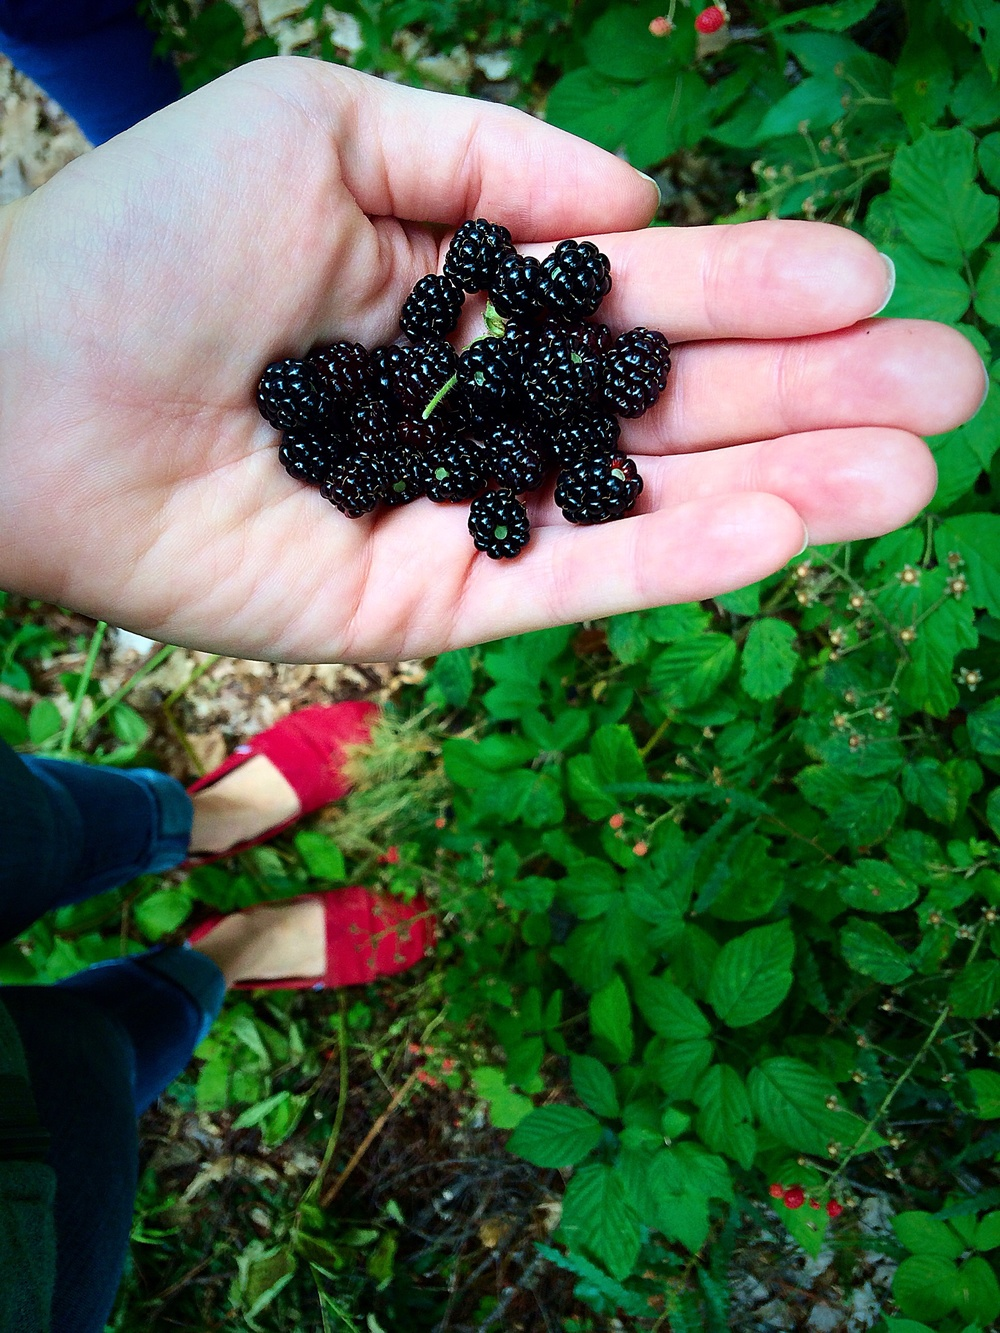 Foraging for wild blackberries